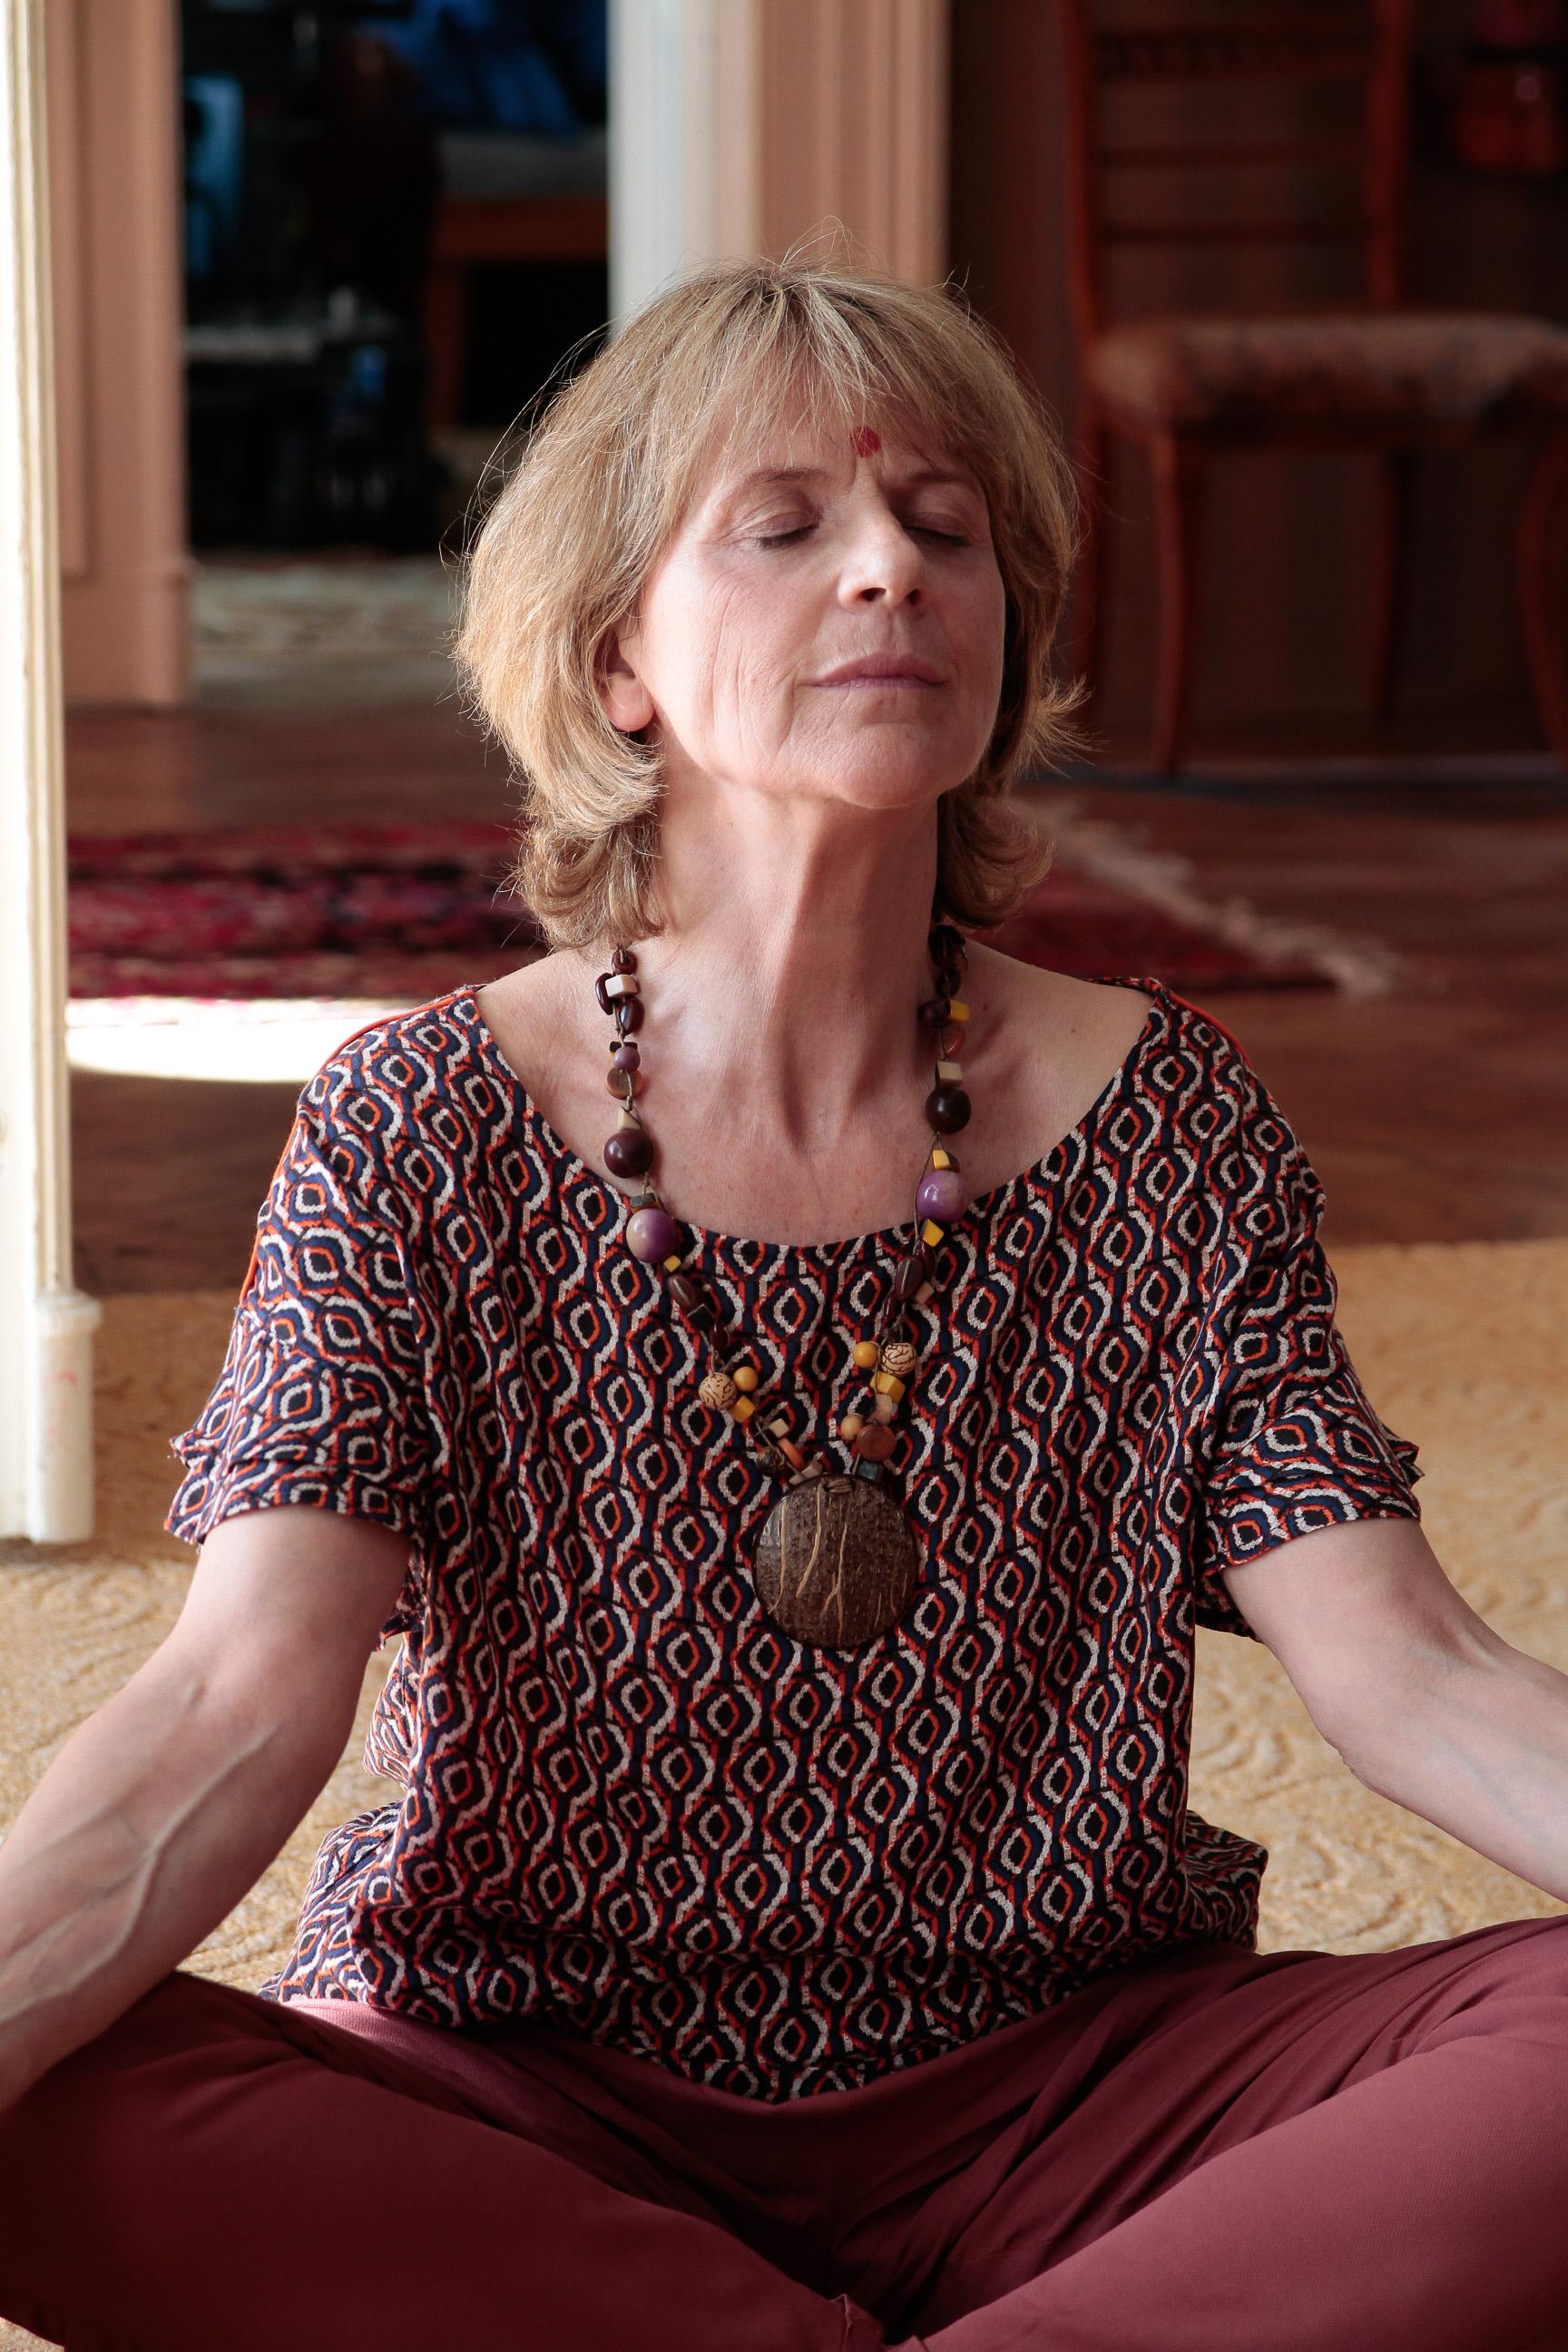 Denise Laurel (b. 1987),Tinsley Mortimer XXX movies Karen Pendleton,Celia Imrie